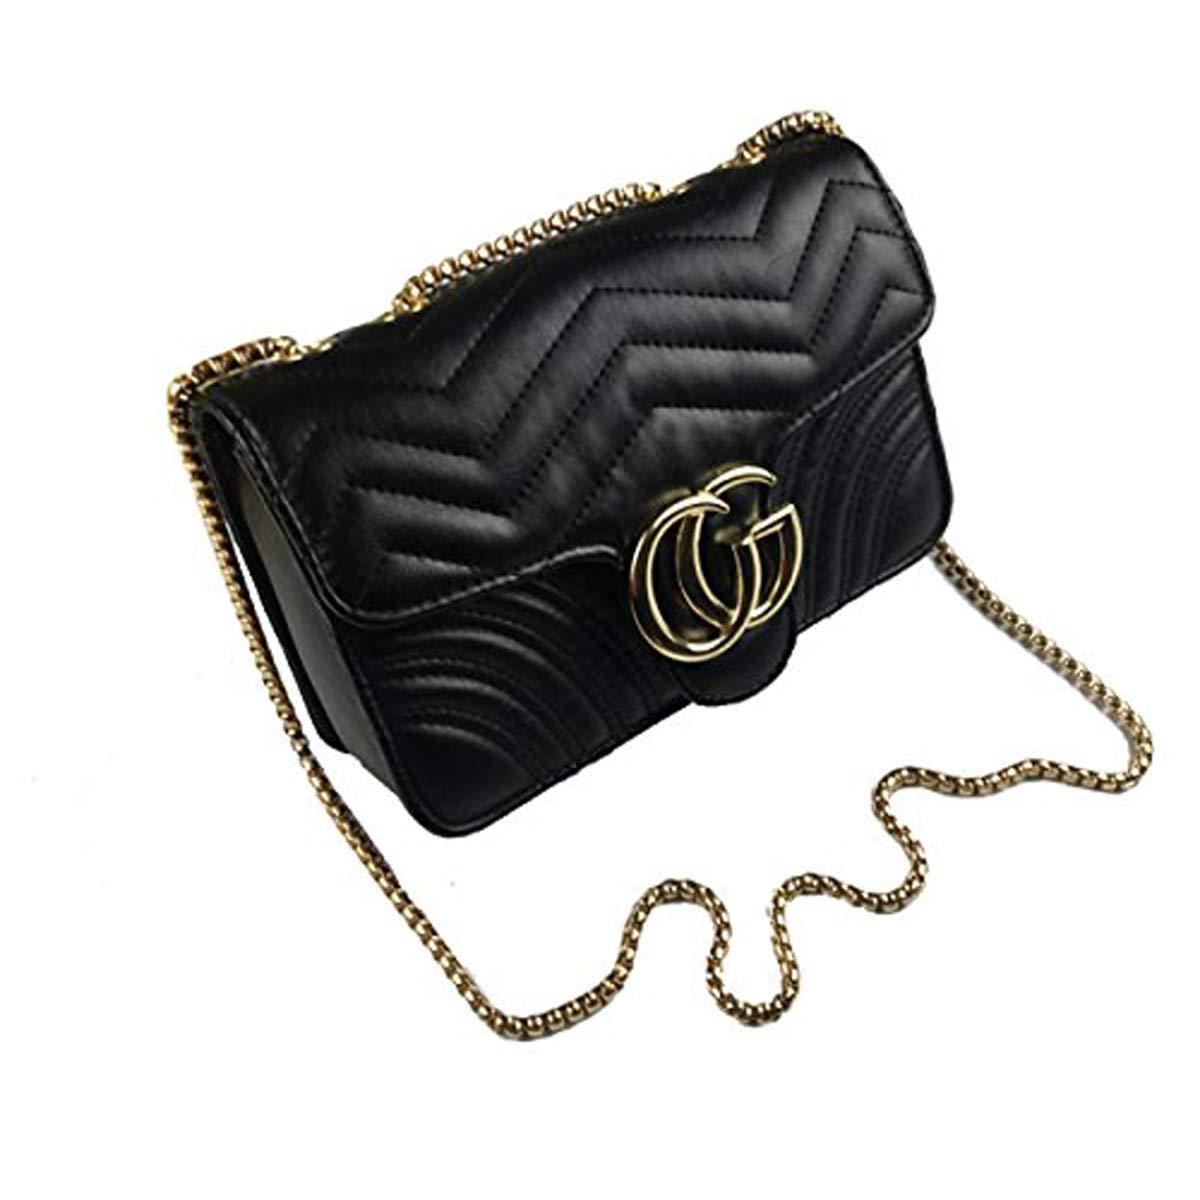 2018 Mini Ladies Women Girls Baby Linger Chain CG Lock Velvet PU Wave Retro Shoulder Bag Crossbody Bag Nappy Bag,Black(CGLetter-Leather)-22 * 8 * 15cm